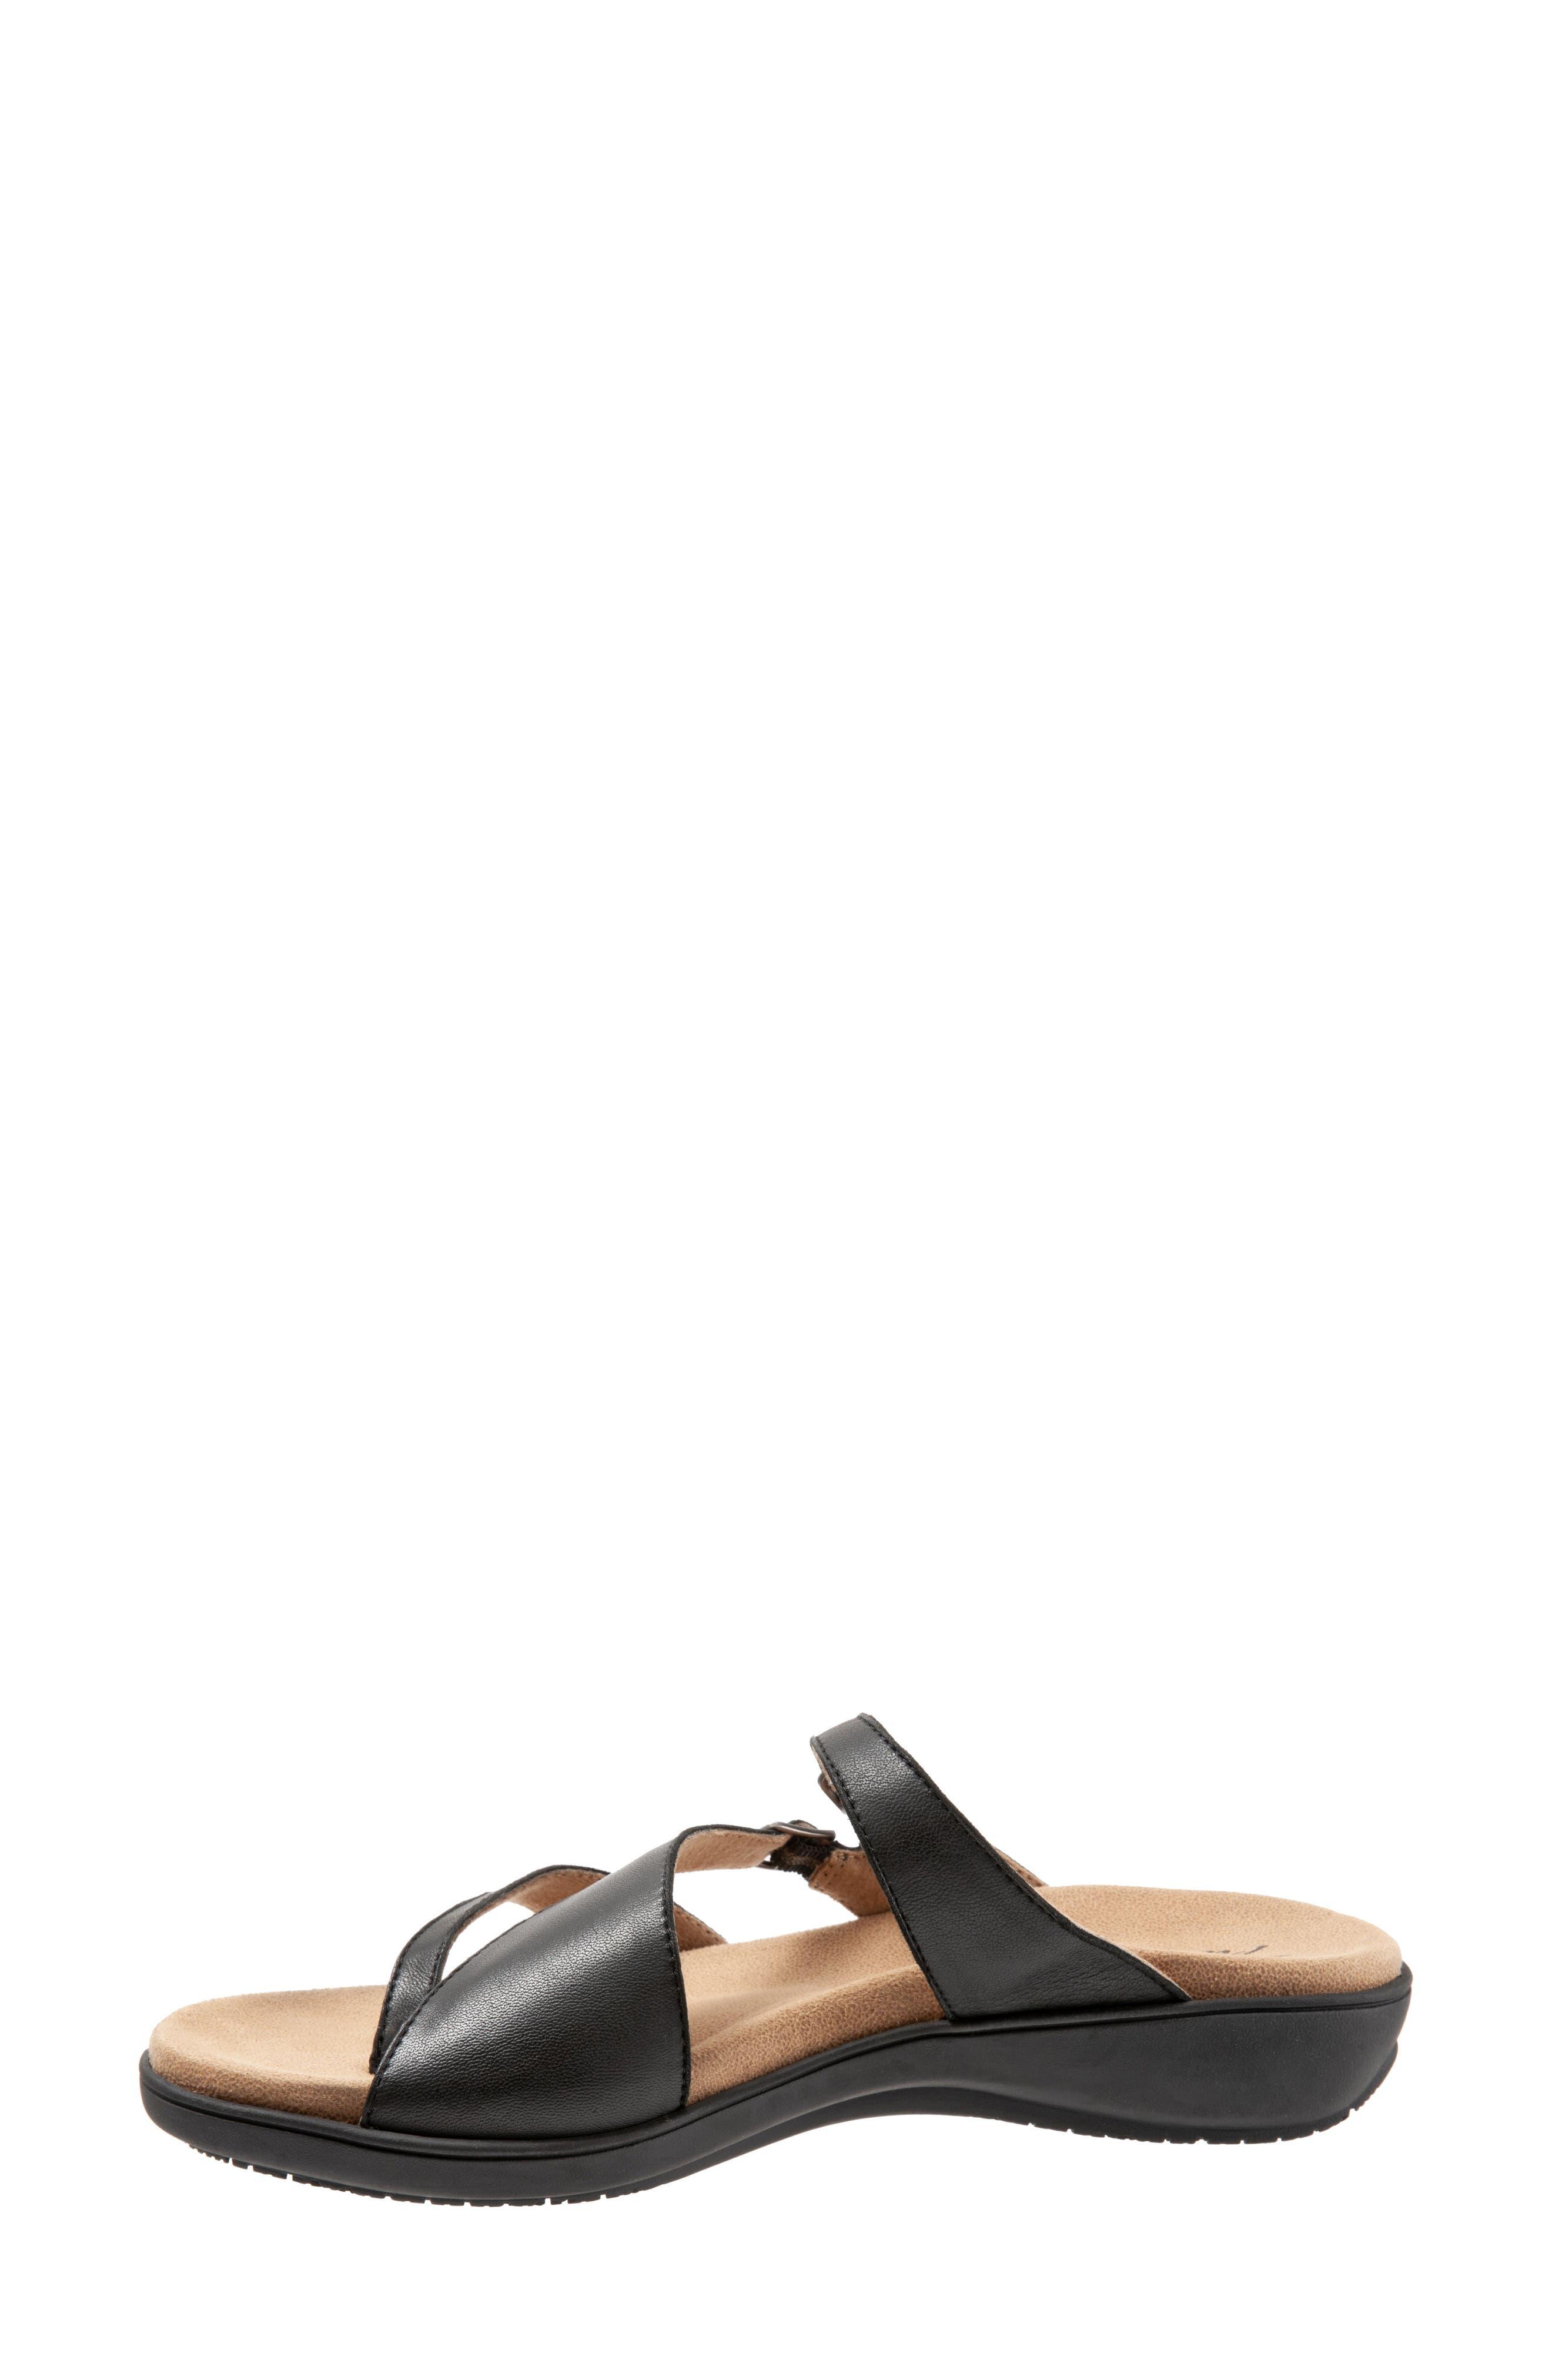 TROTTERS,                             Vanna Slide Sandal,                             Alternate thumbnail 8, color,                             BLACK LEATHER